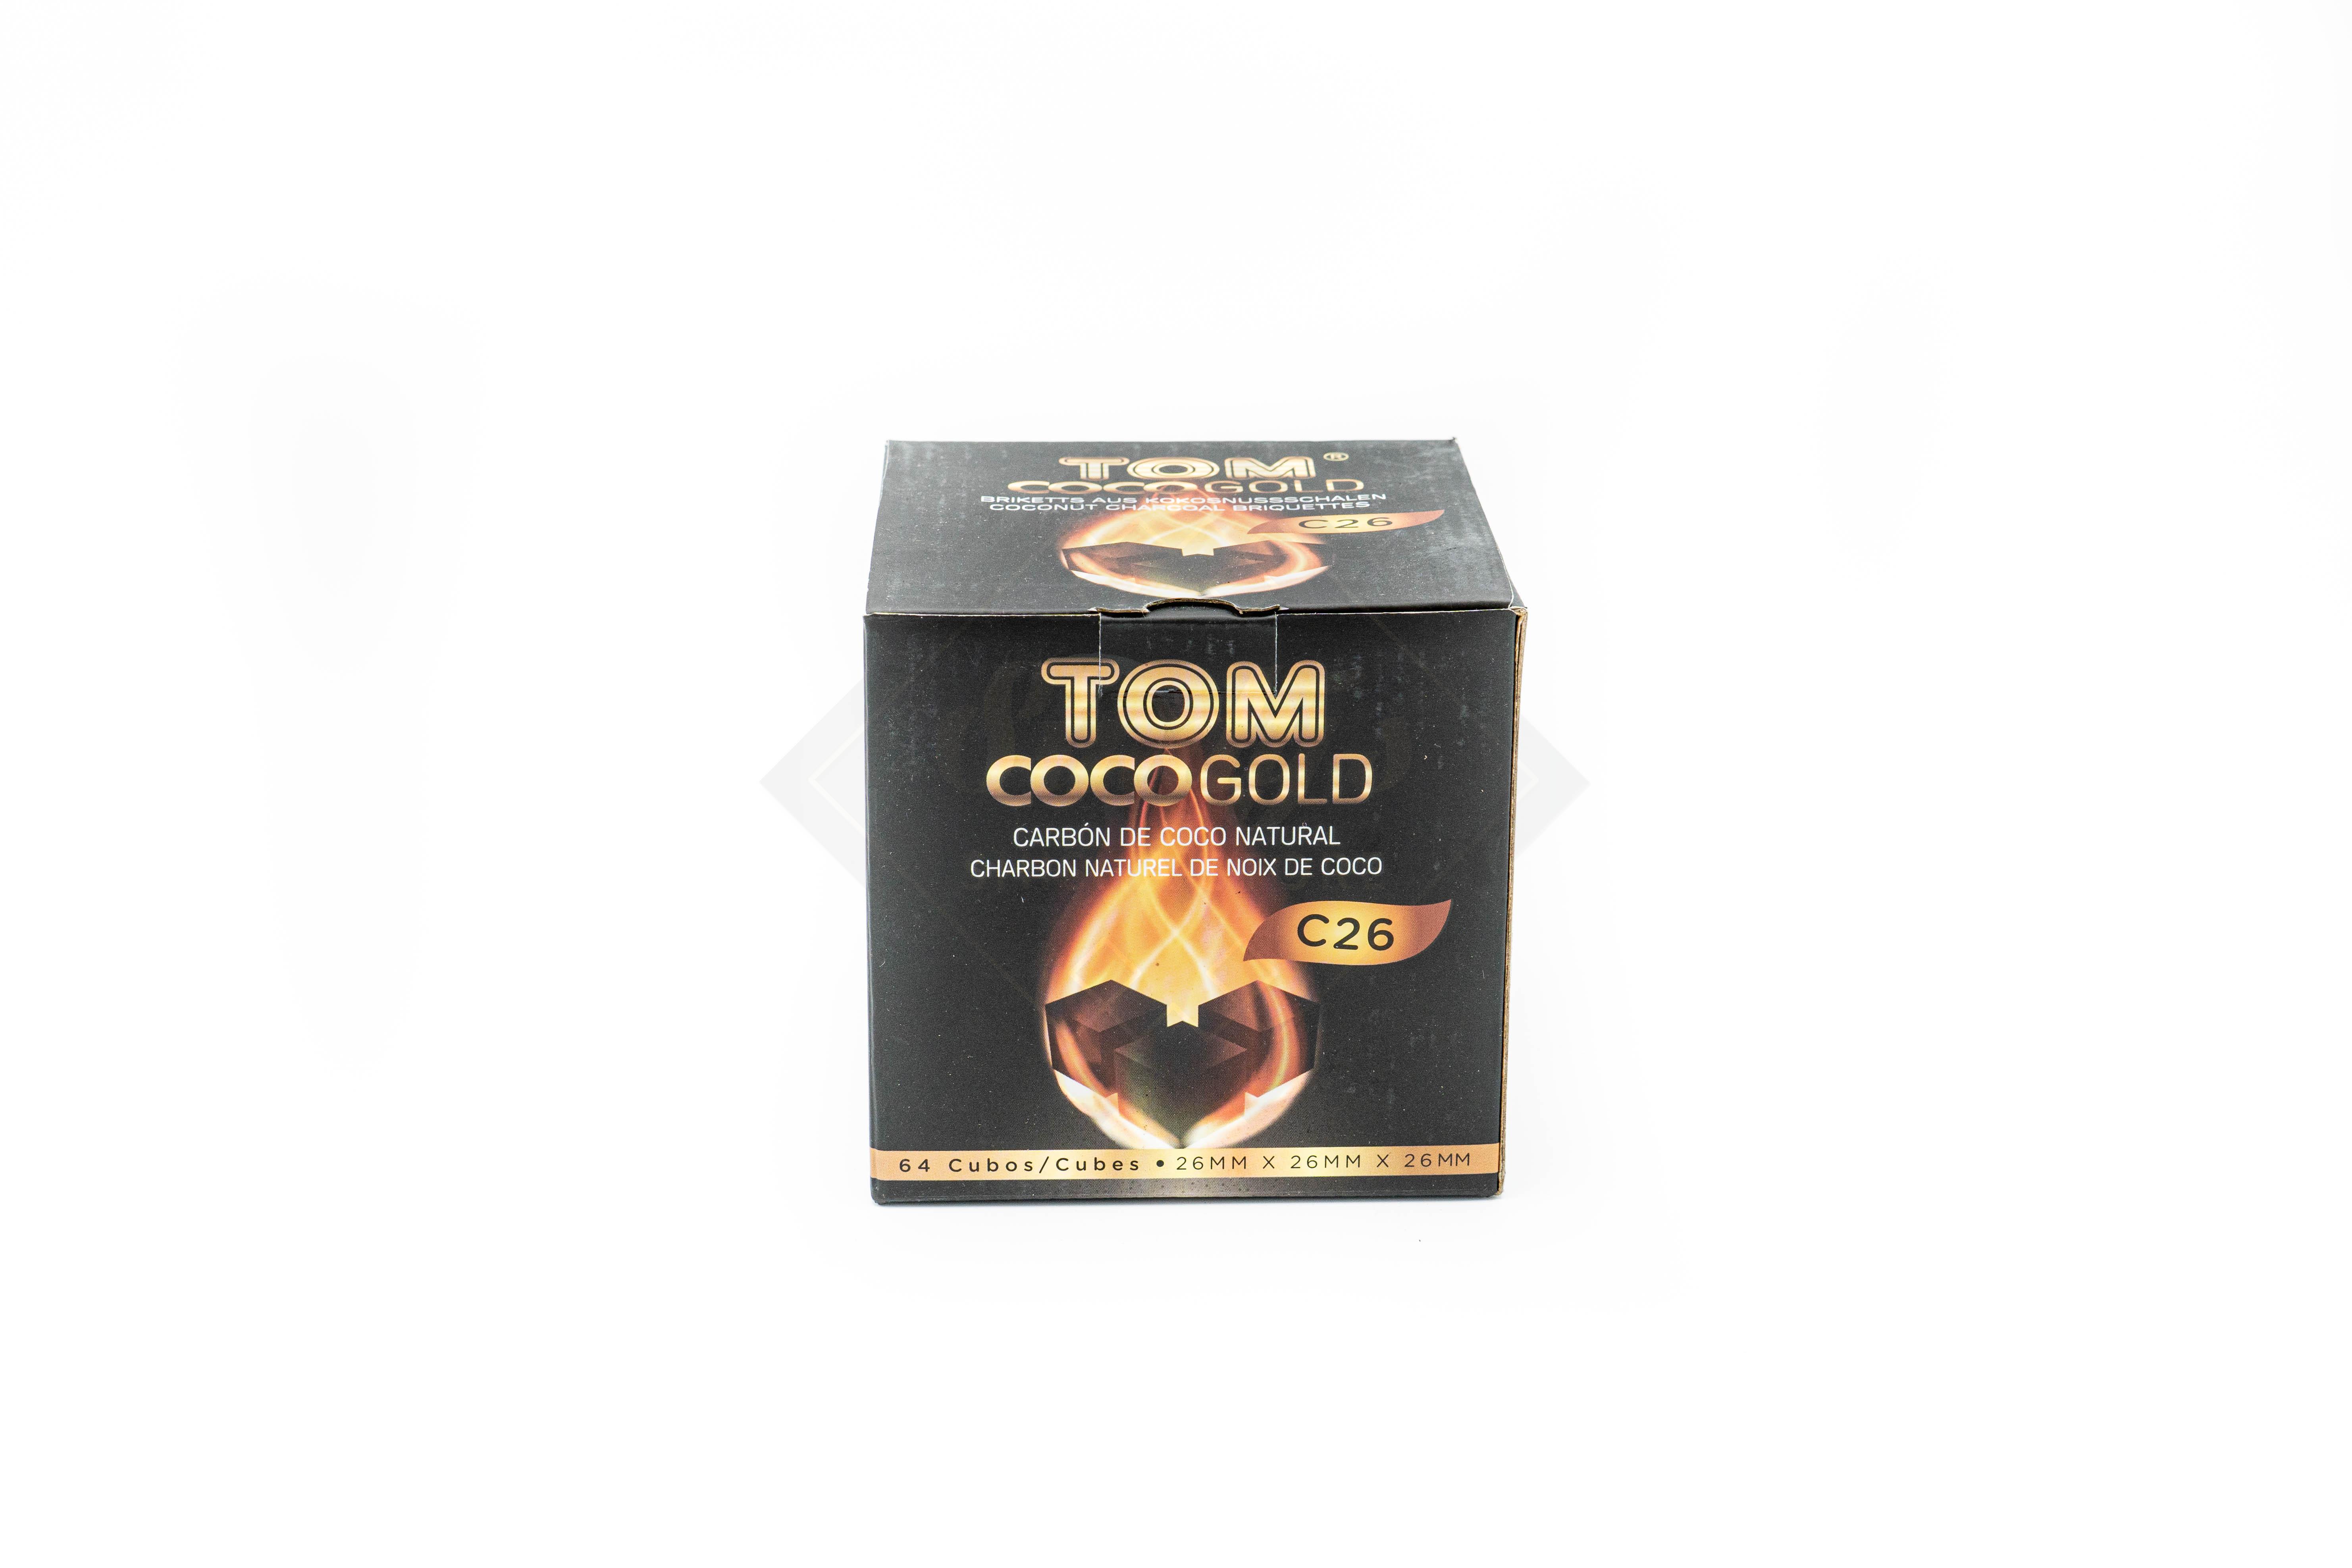 Tom Cococha Gold C26 - 1Kg